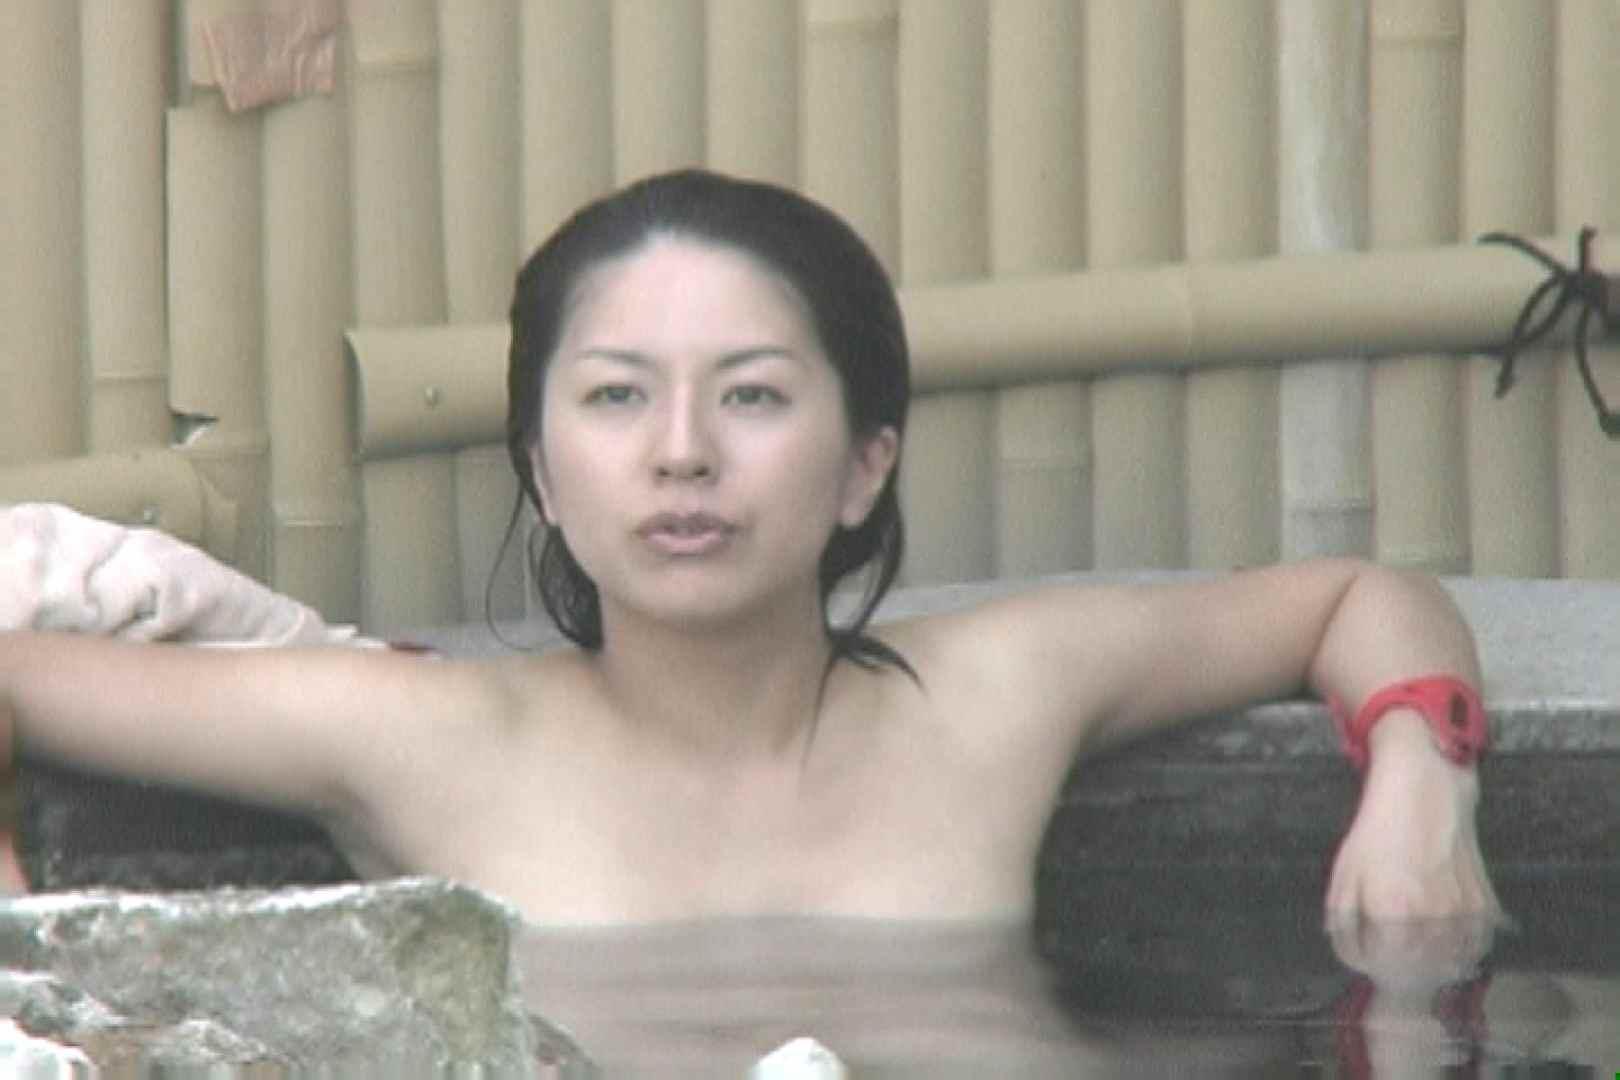 Aquaな露天風呂Vol.694 盗撮 | OLエロ画像  110PICs 64